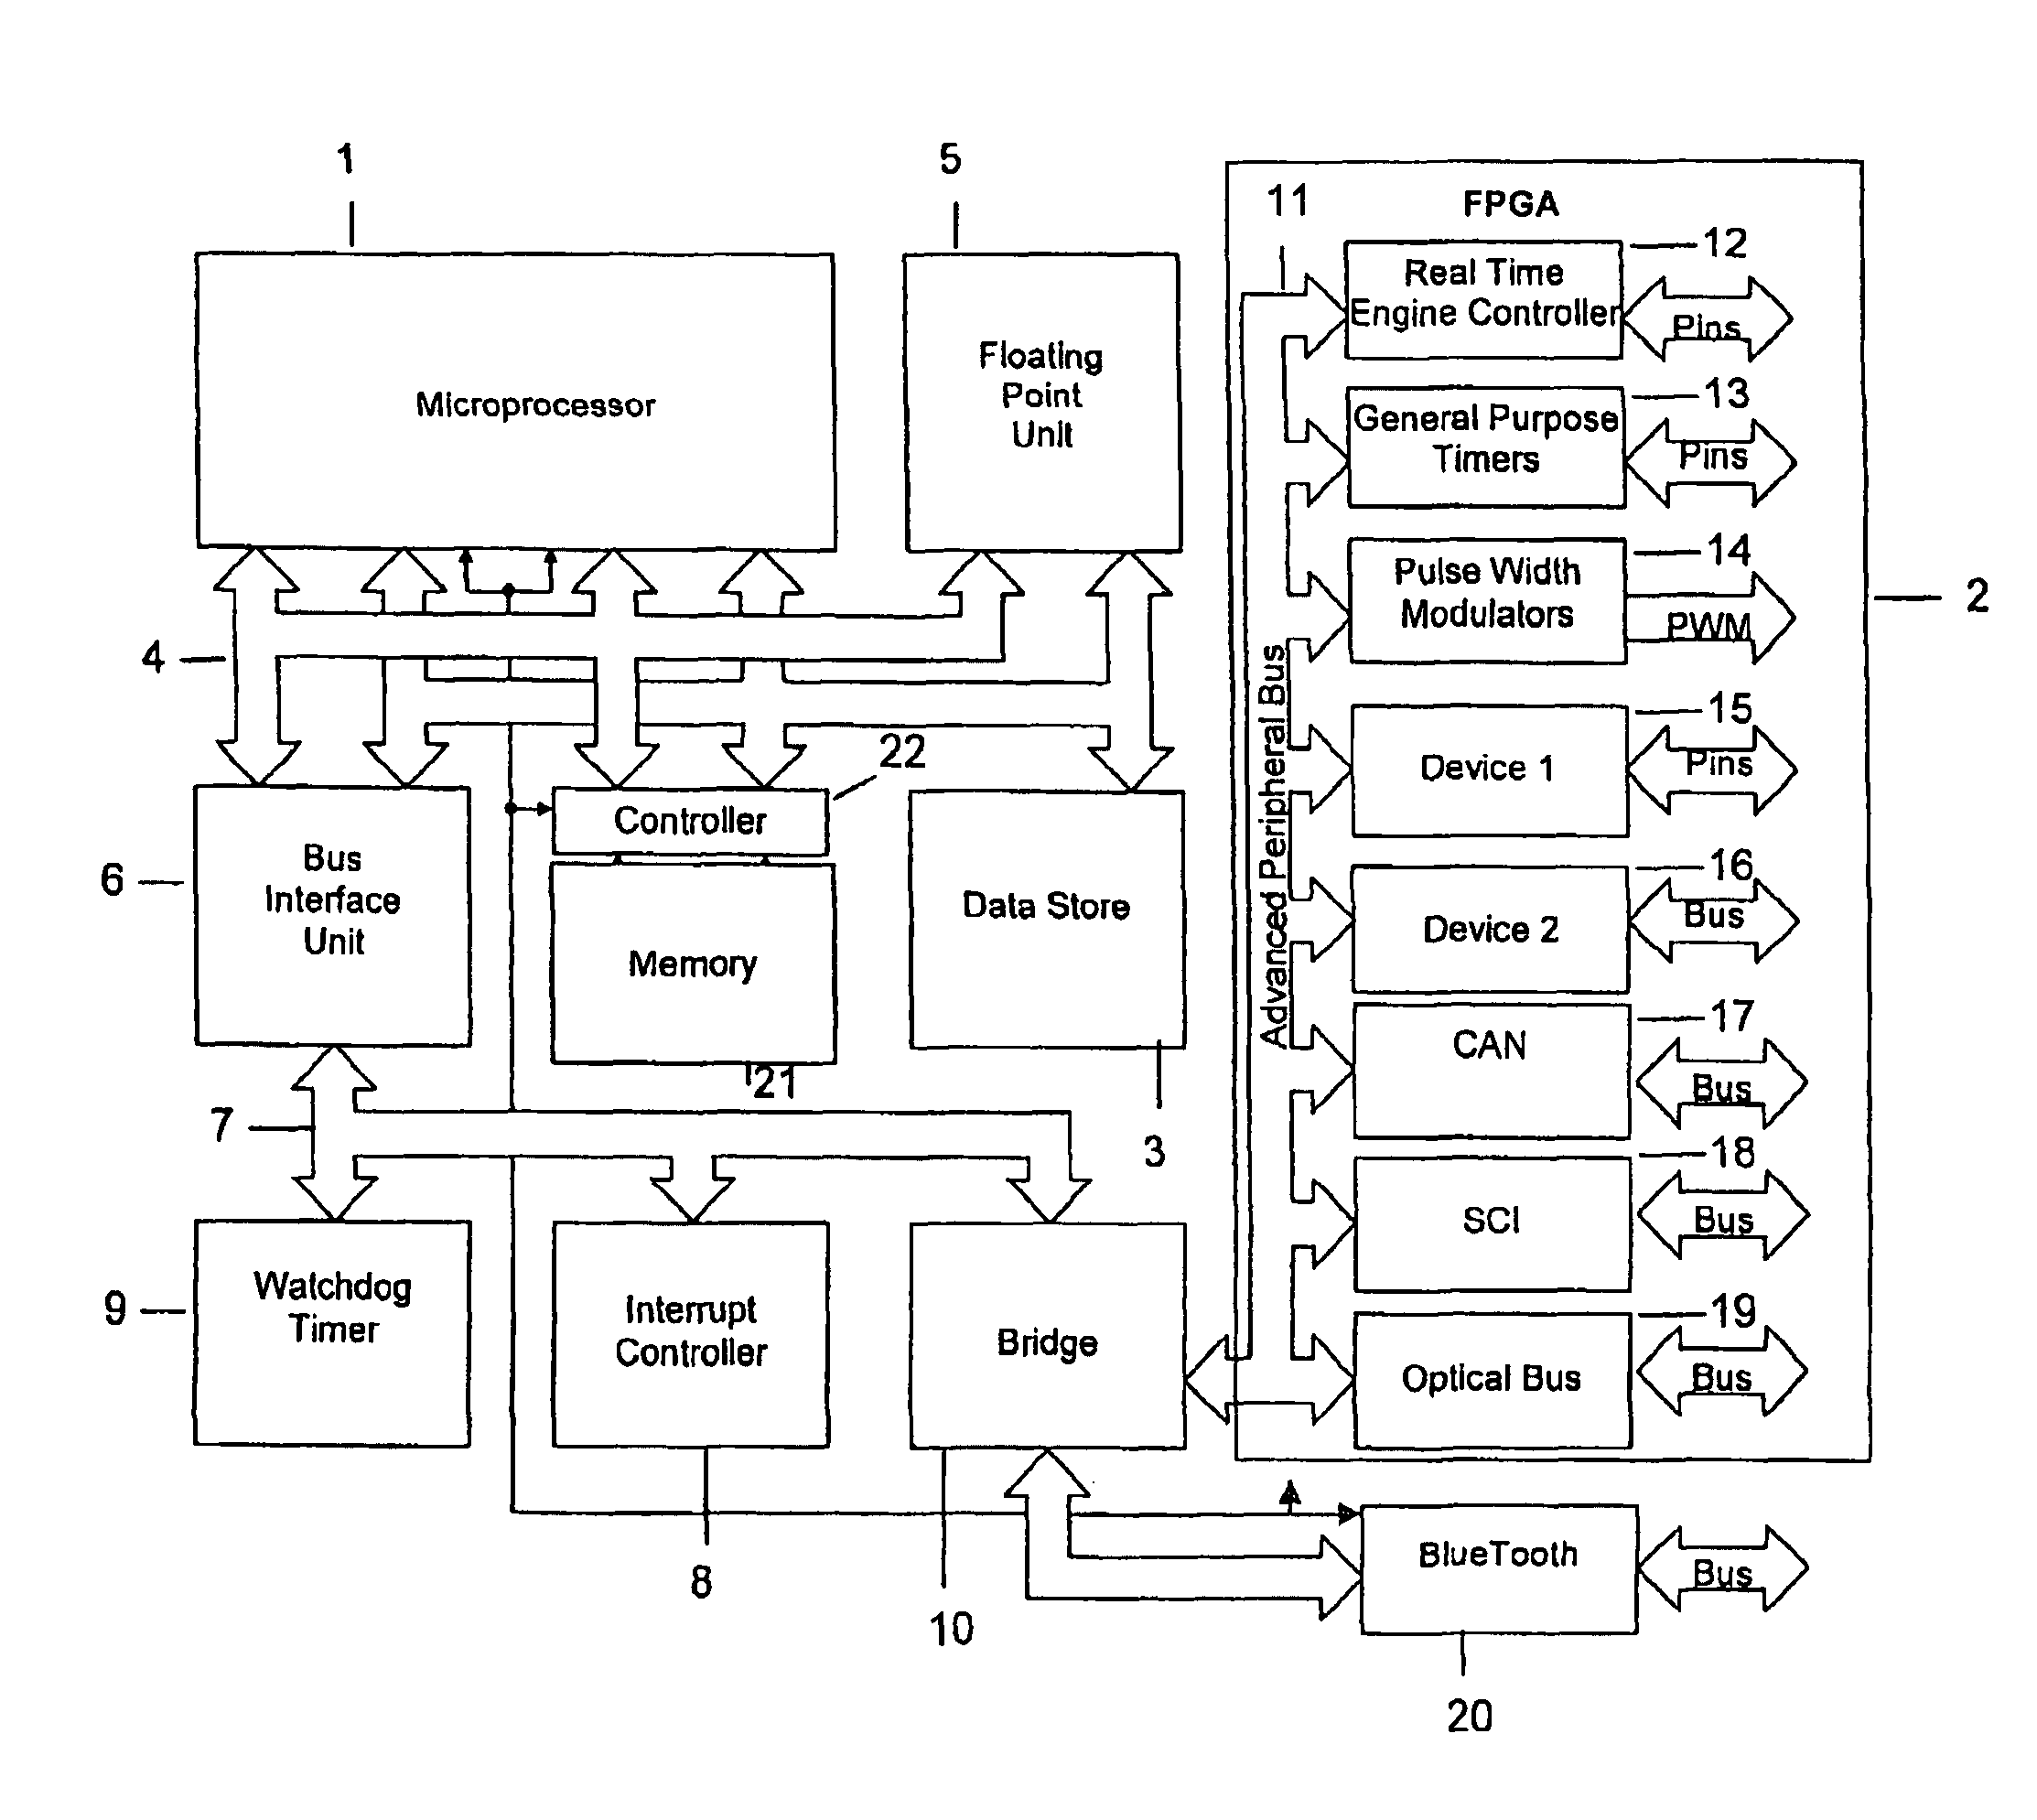 patent usre43619 - universal computer architecture - google patents